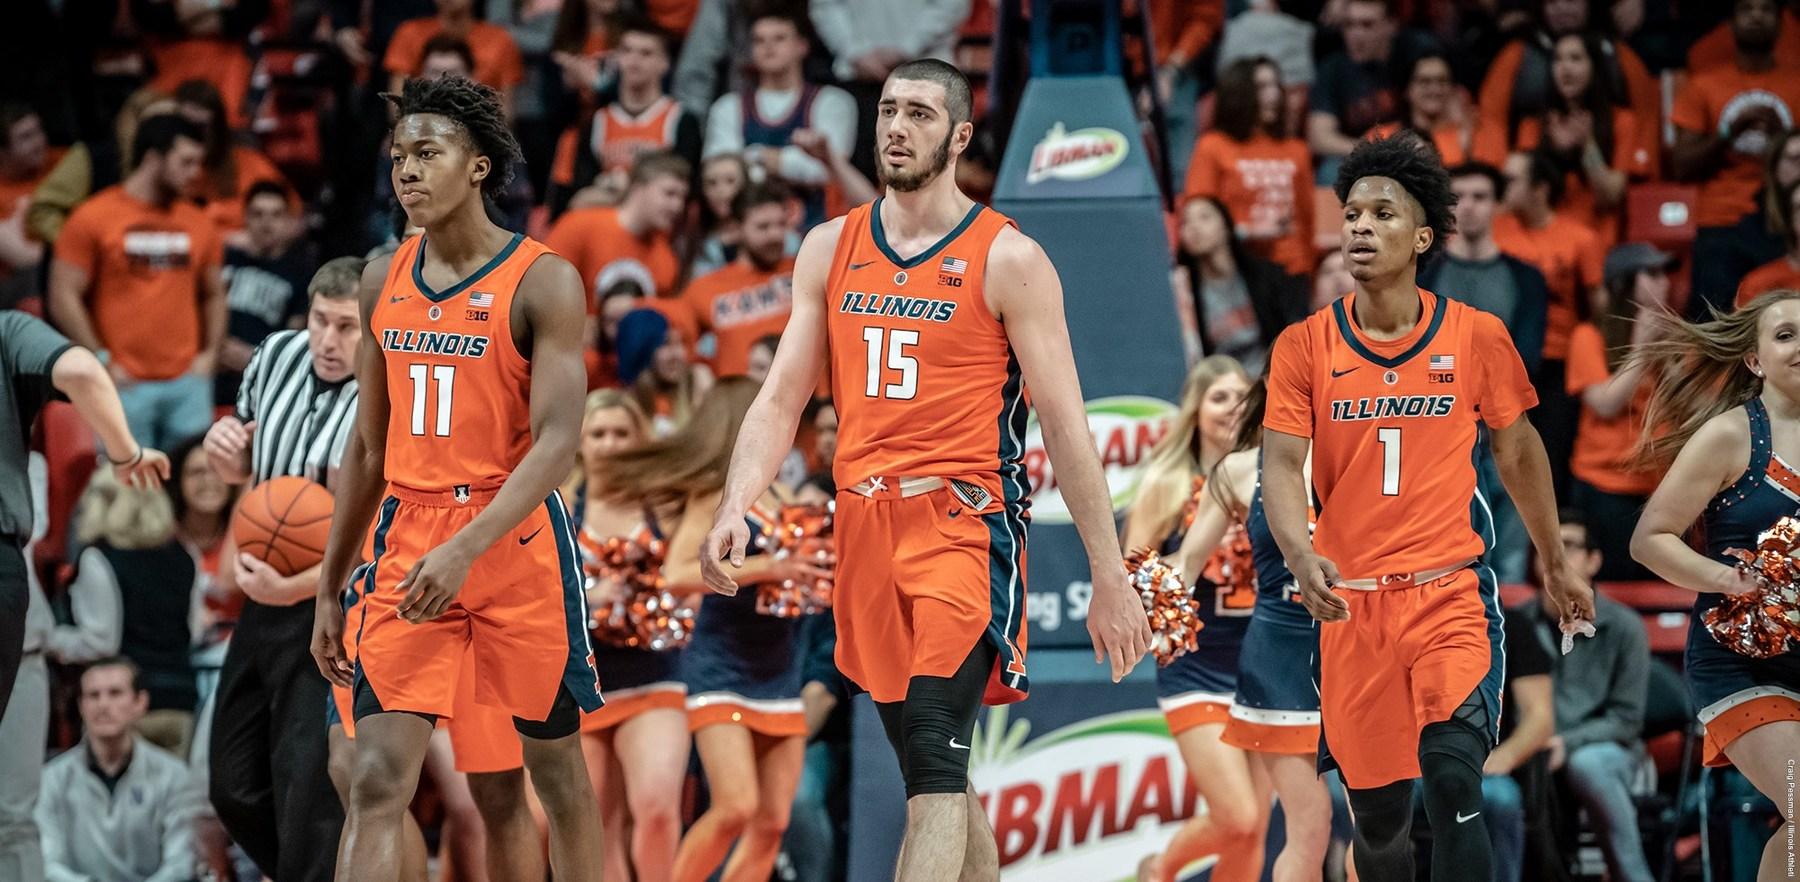 freshman Ayo Dosunmu, sophomore Trent Frazier, and freshman Giorgi Bezhanishvili walk in tandem across a basketball court